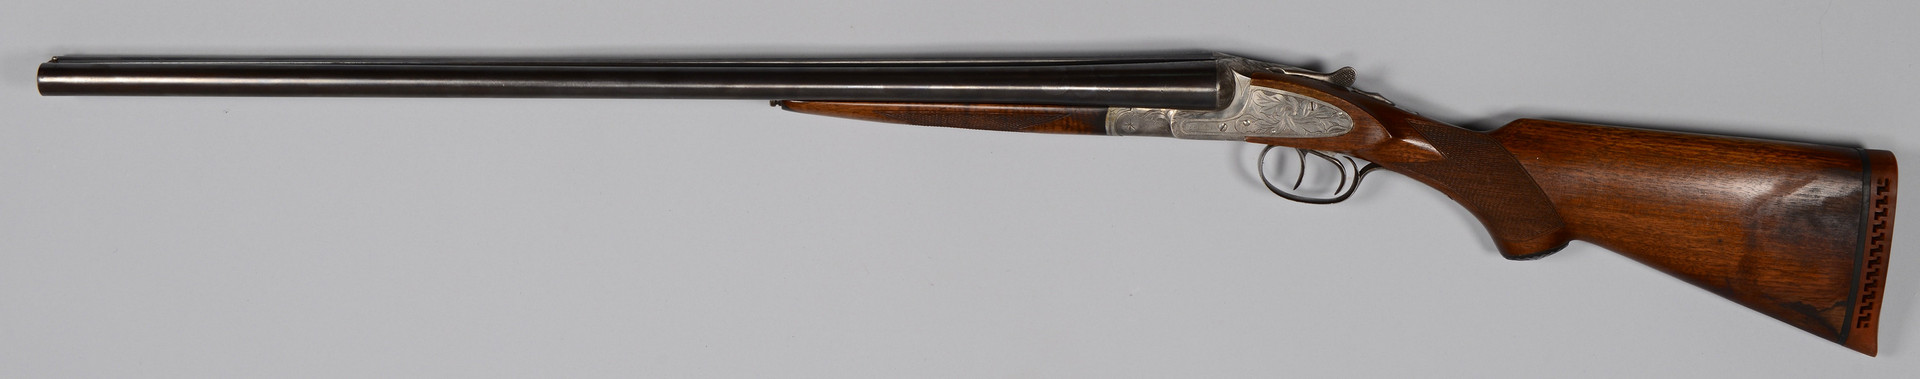 Lot 722: L.C. Smith Shotgun